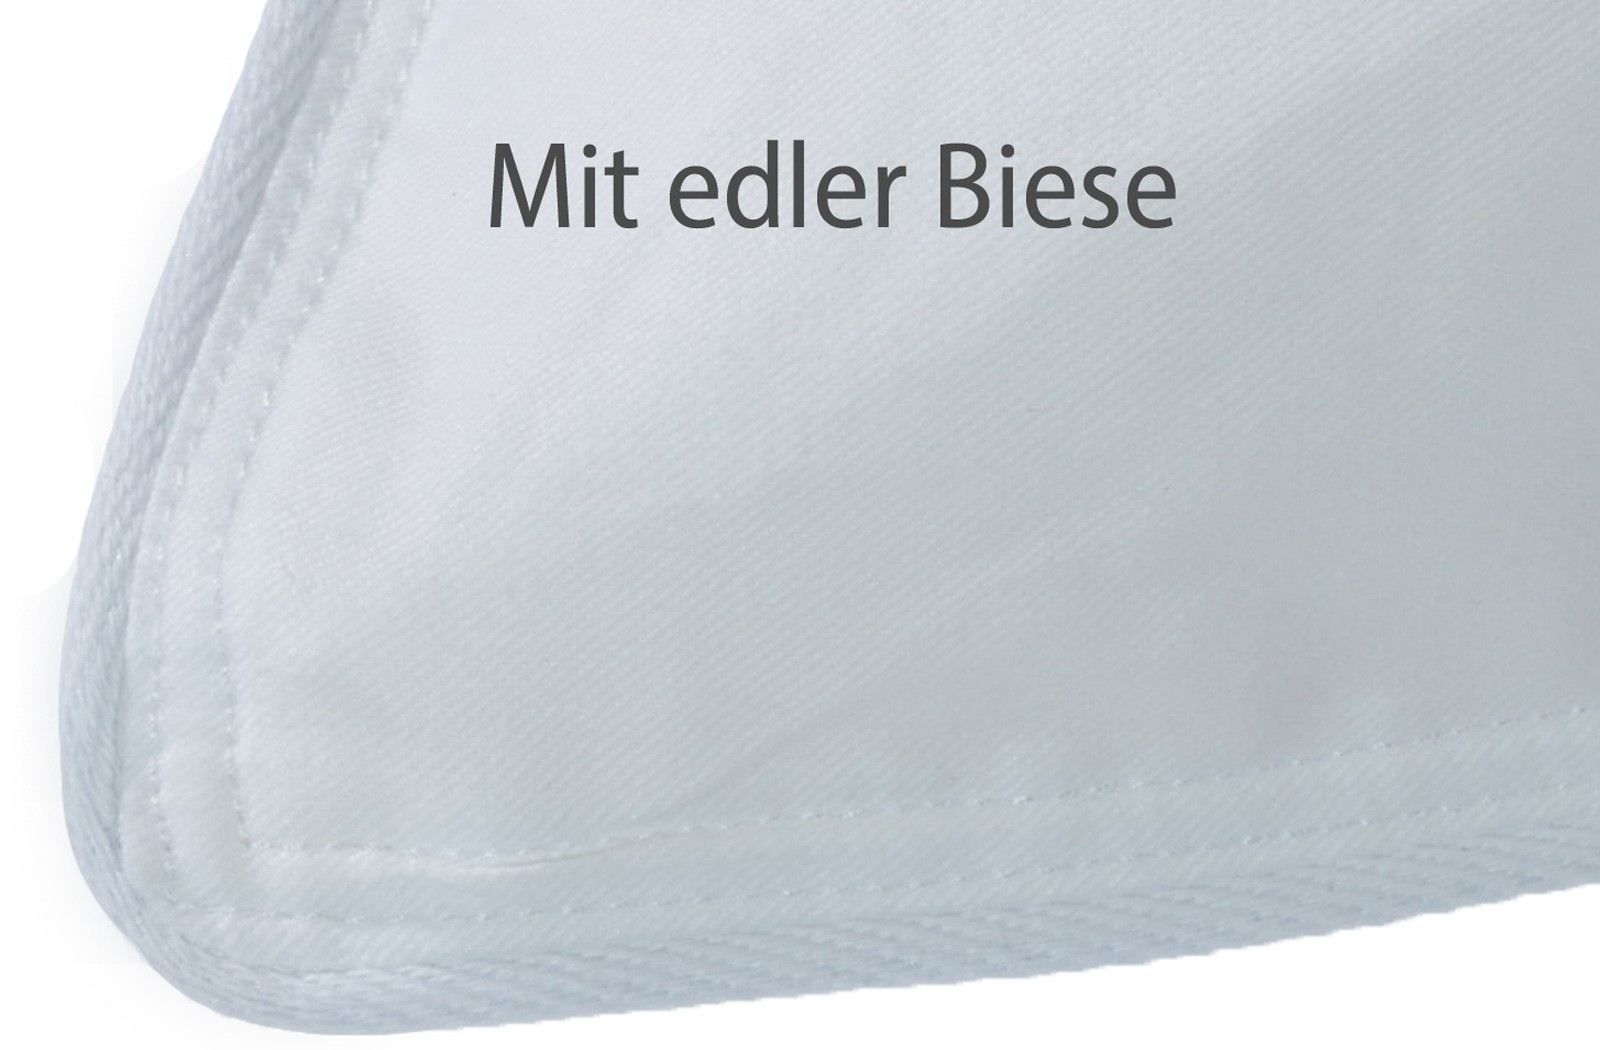 2x Kopfkissen 30% Gänse-Daunen Kissen Federn Klasse 1 40x80 Christin – Bild 6